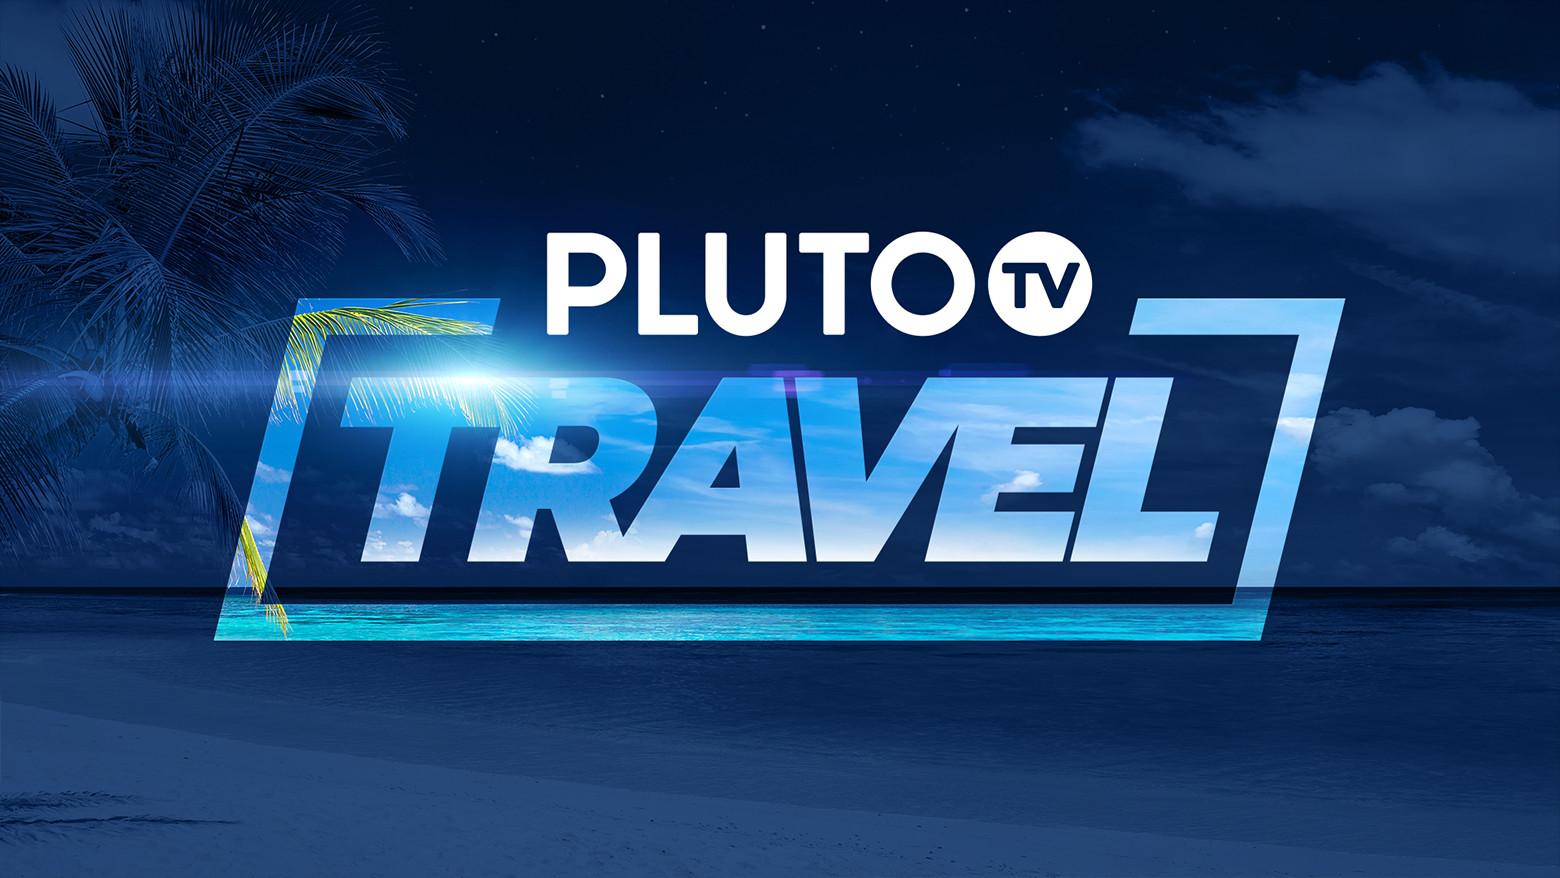 Pluto TV Travel_featuredImage.jpg